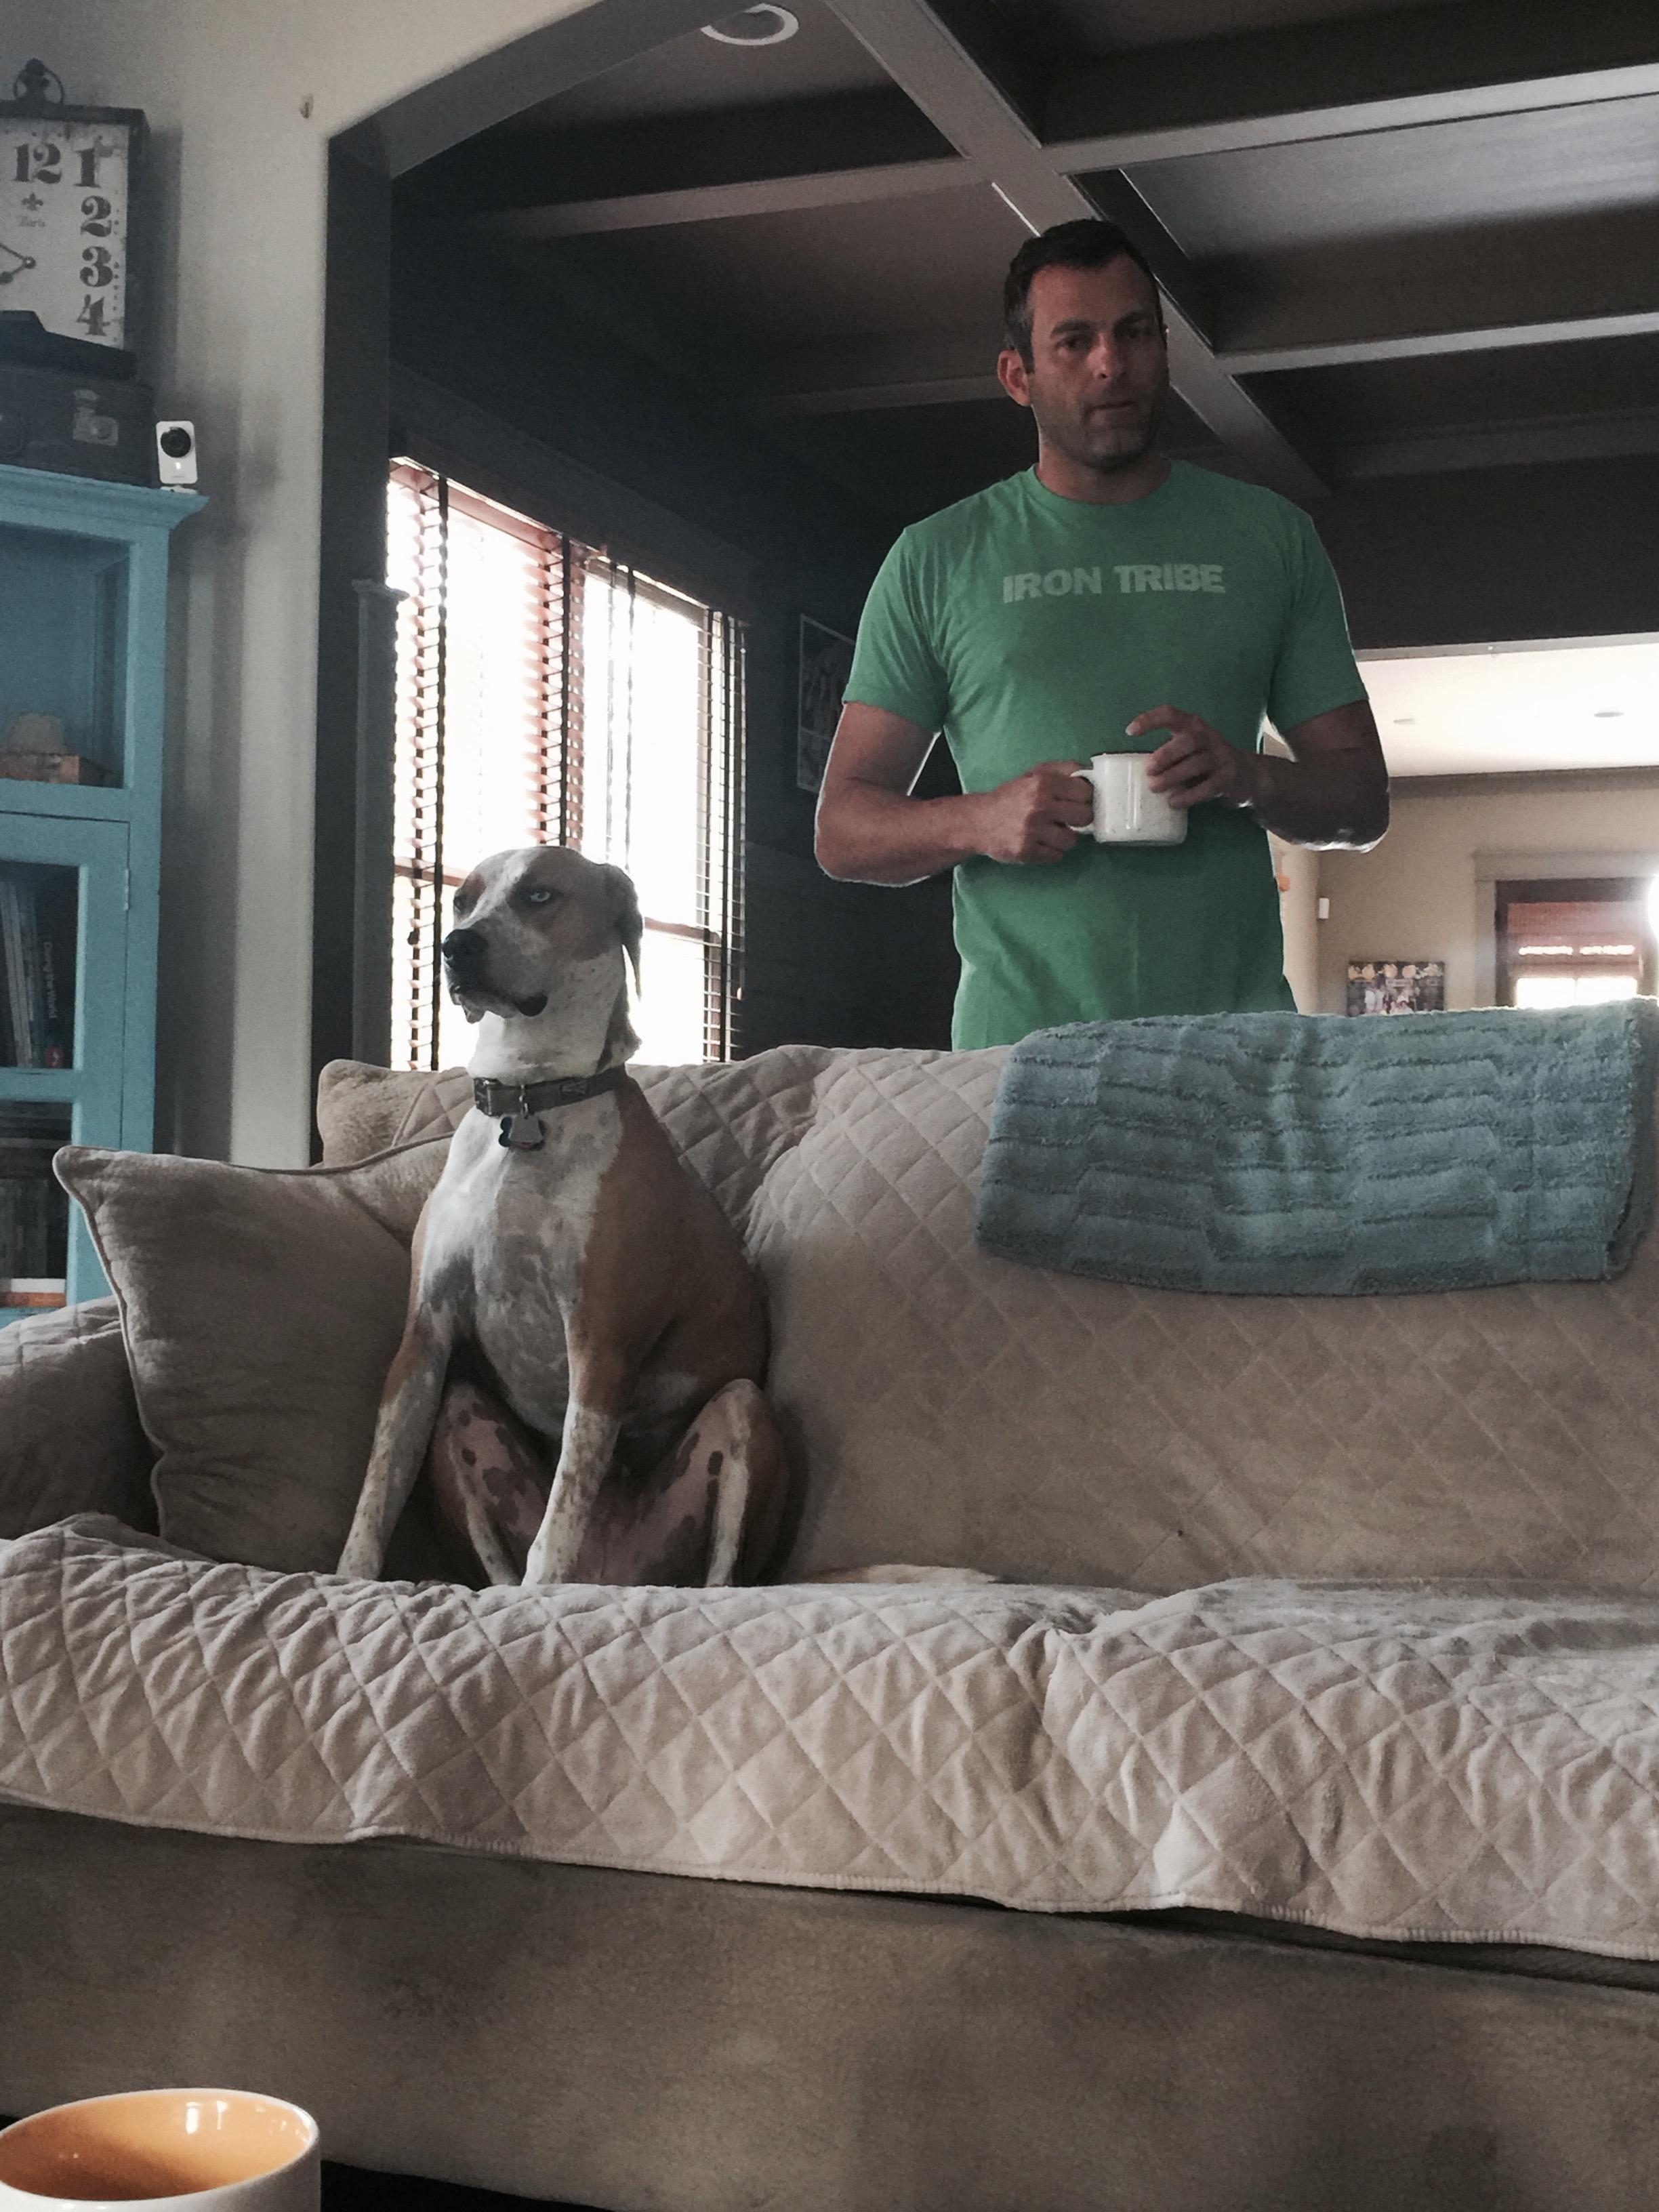 Blu & Norm - Keeping an eye on things!